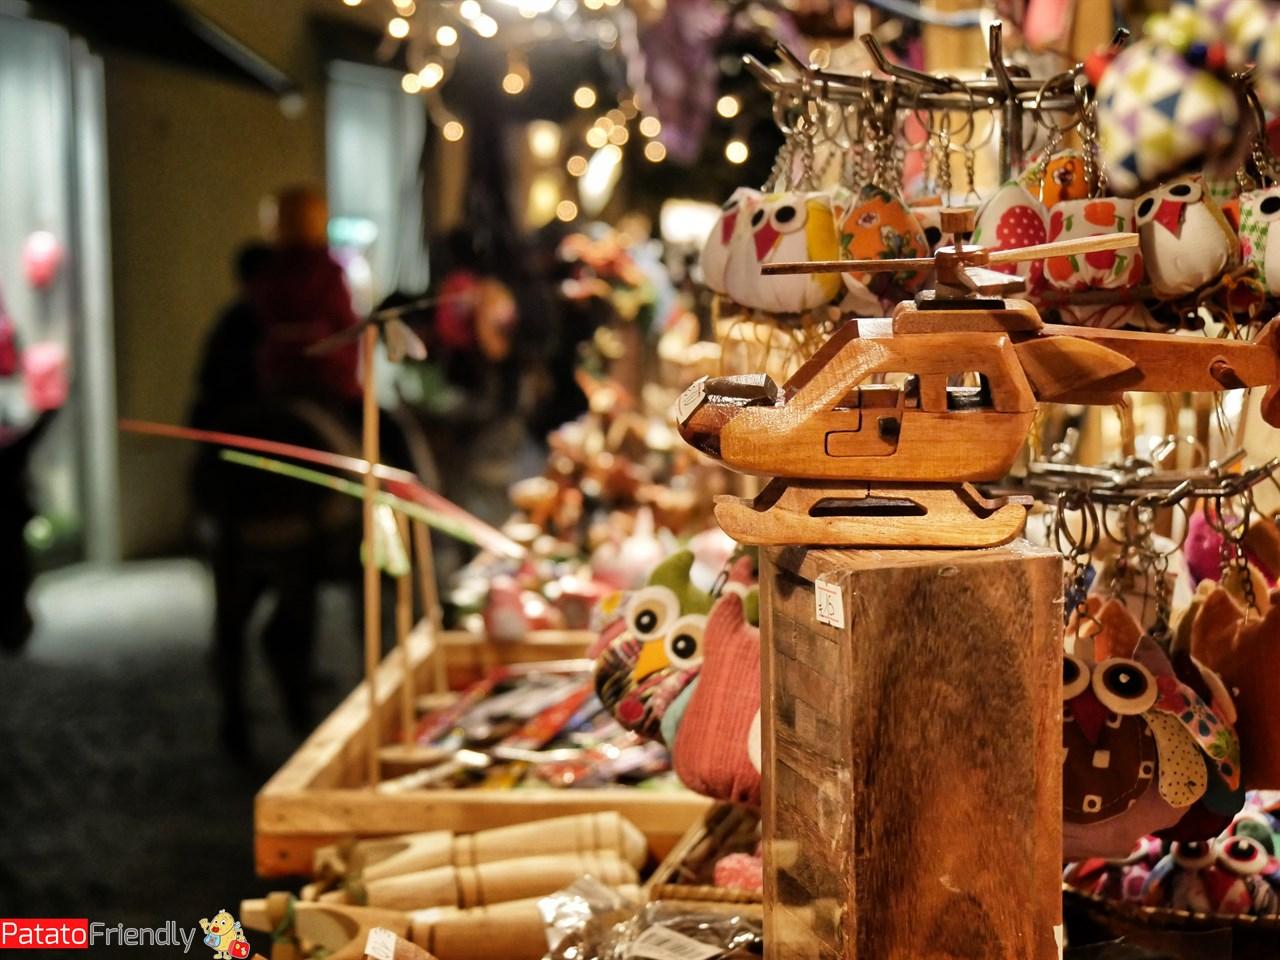 [cml_media_alt id='13033']I mercatini natalizi del Garda Trentino[/cml_media_alt]